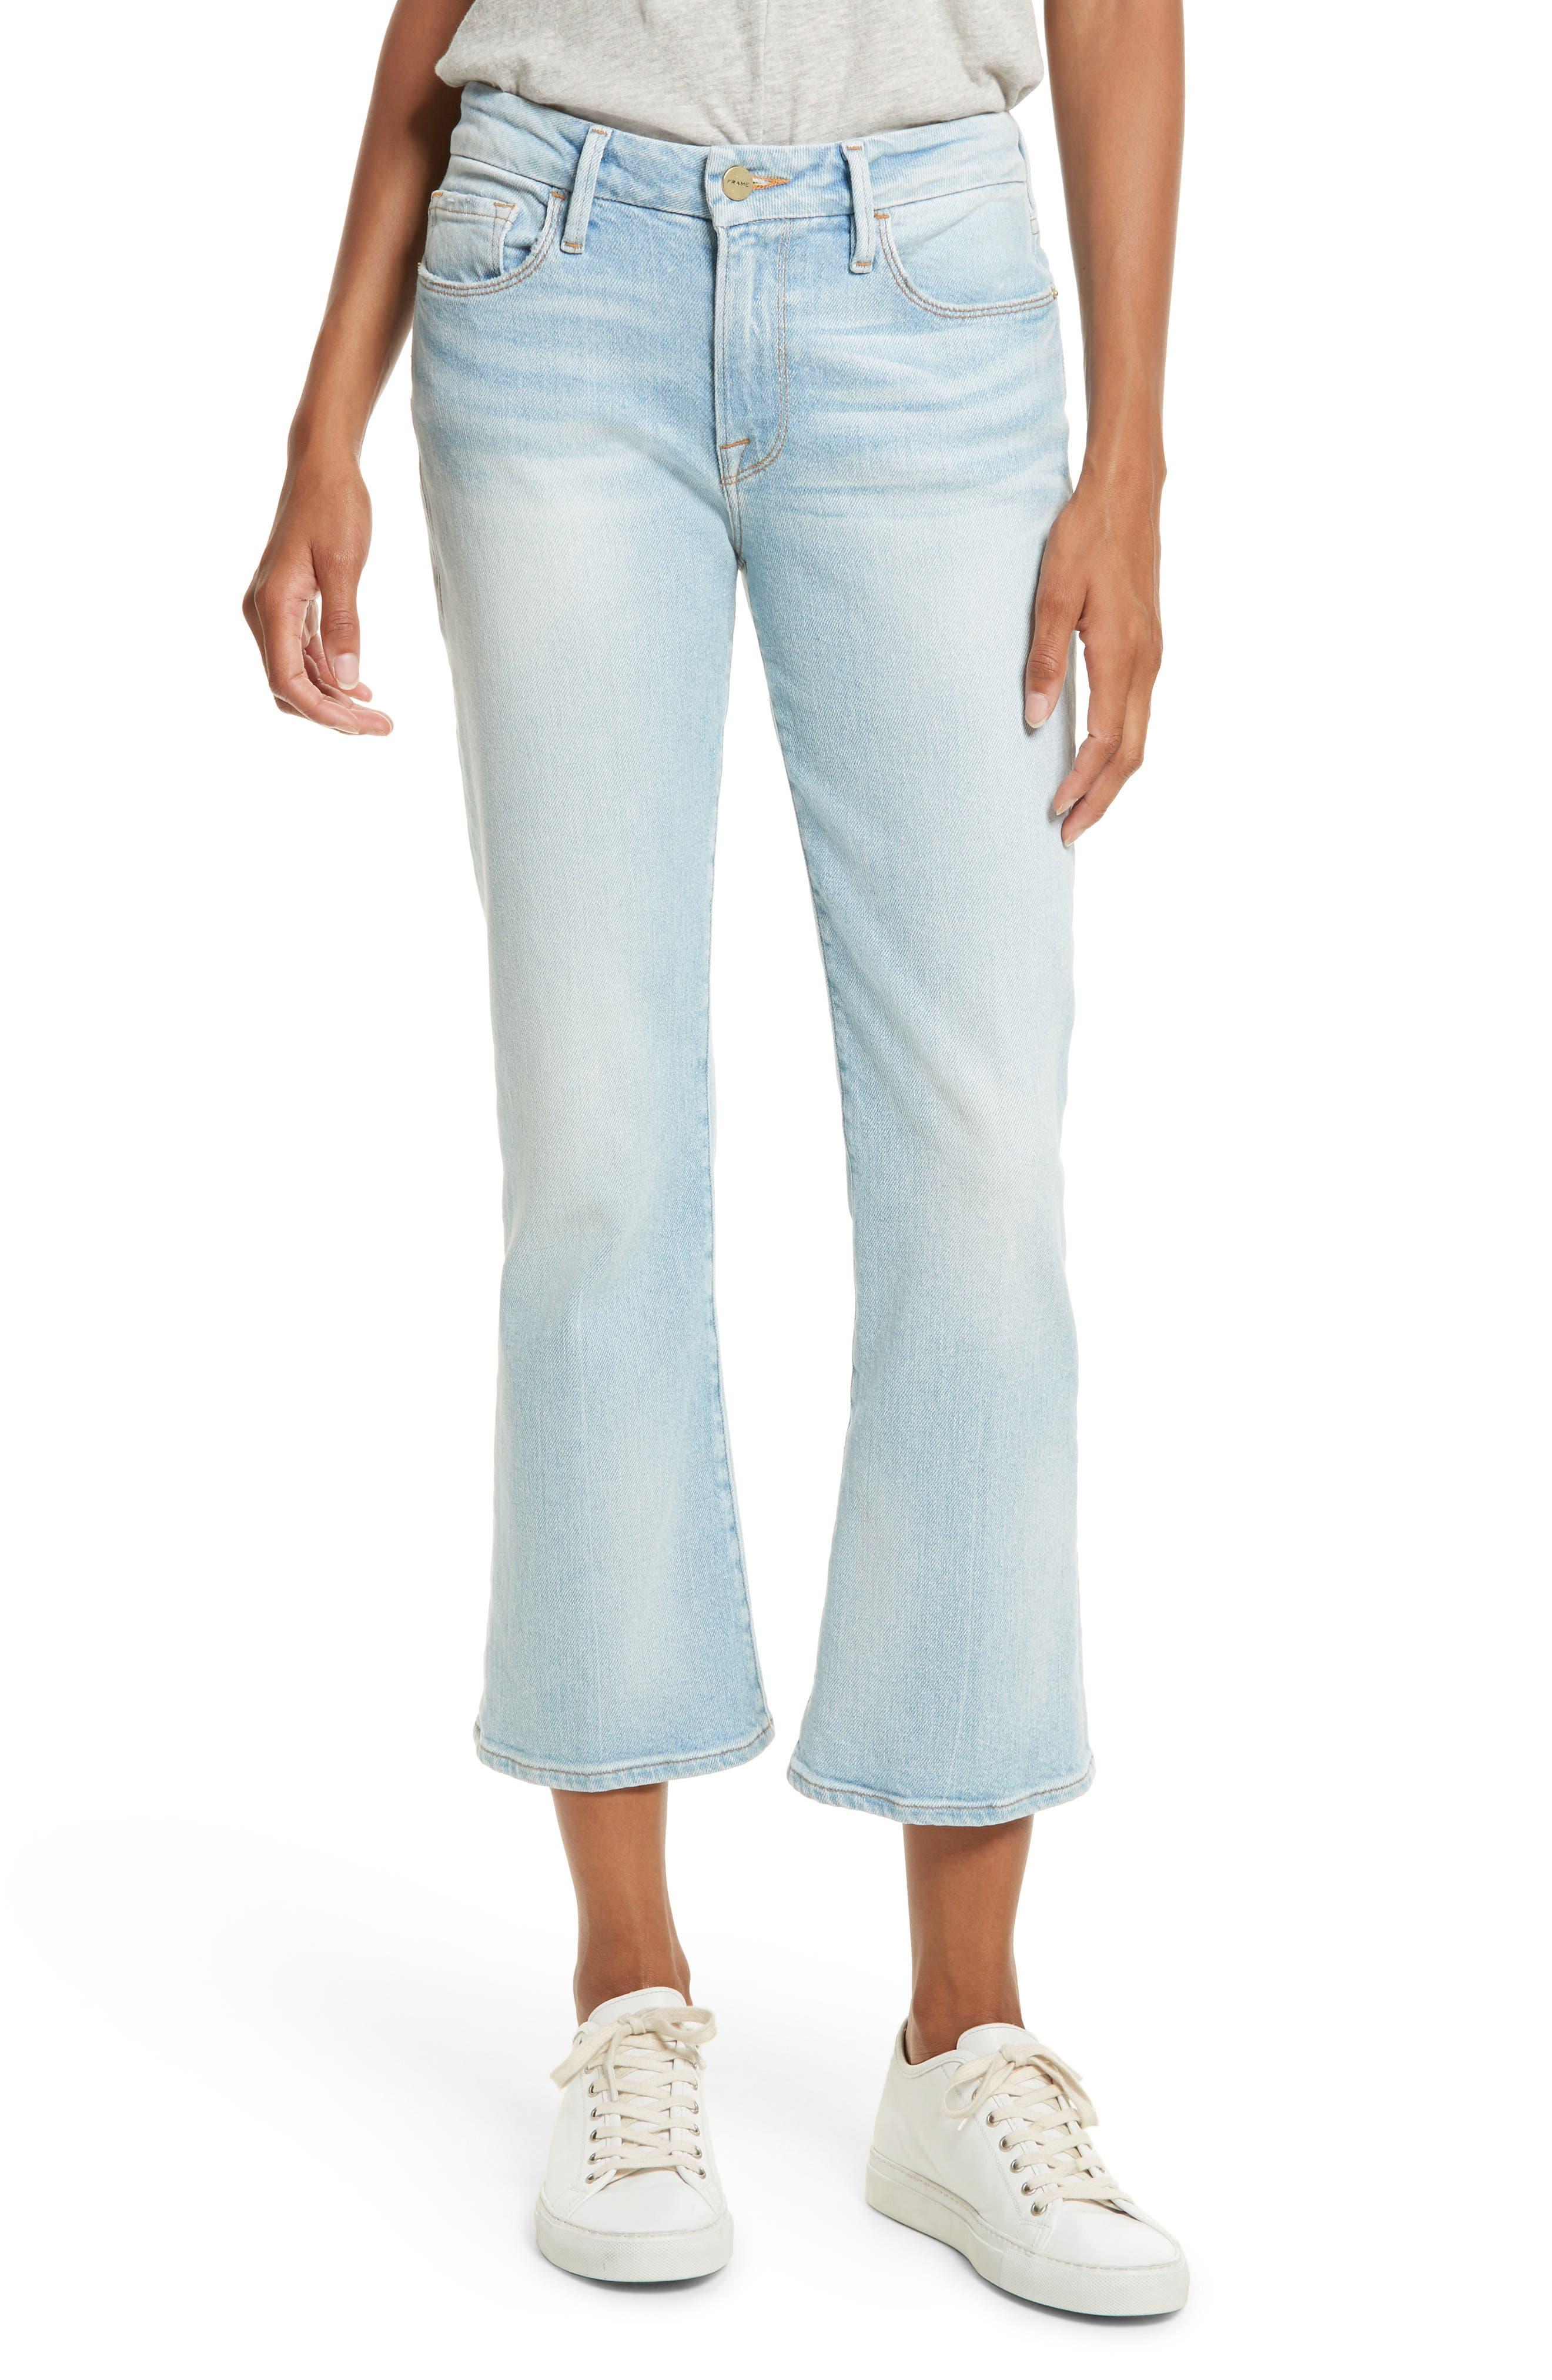 Alternate Image 1 Selected - FRAME Le Crop Mini Boot Jeans (Adeline)